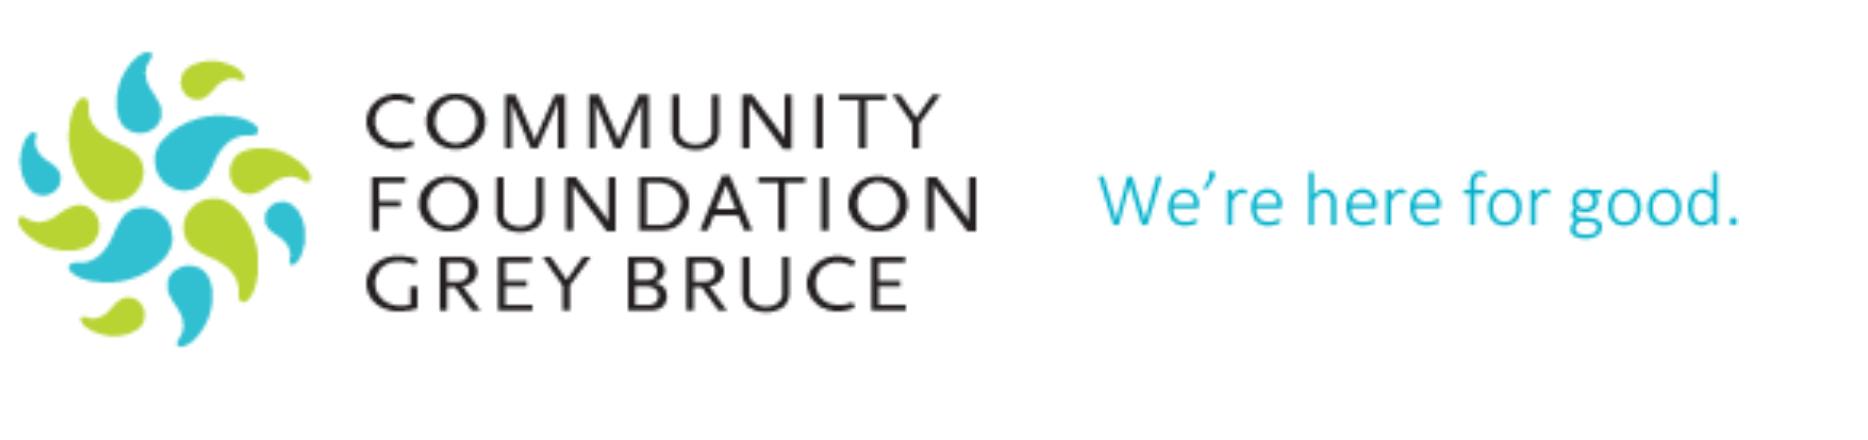 Community Foundation Grey Bruce Logo